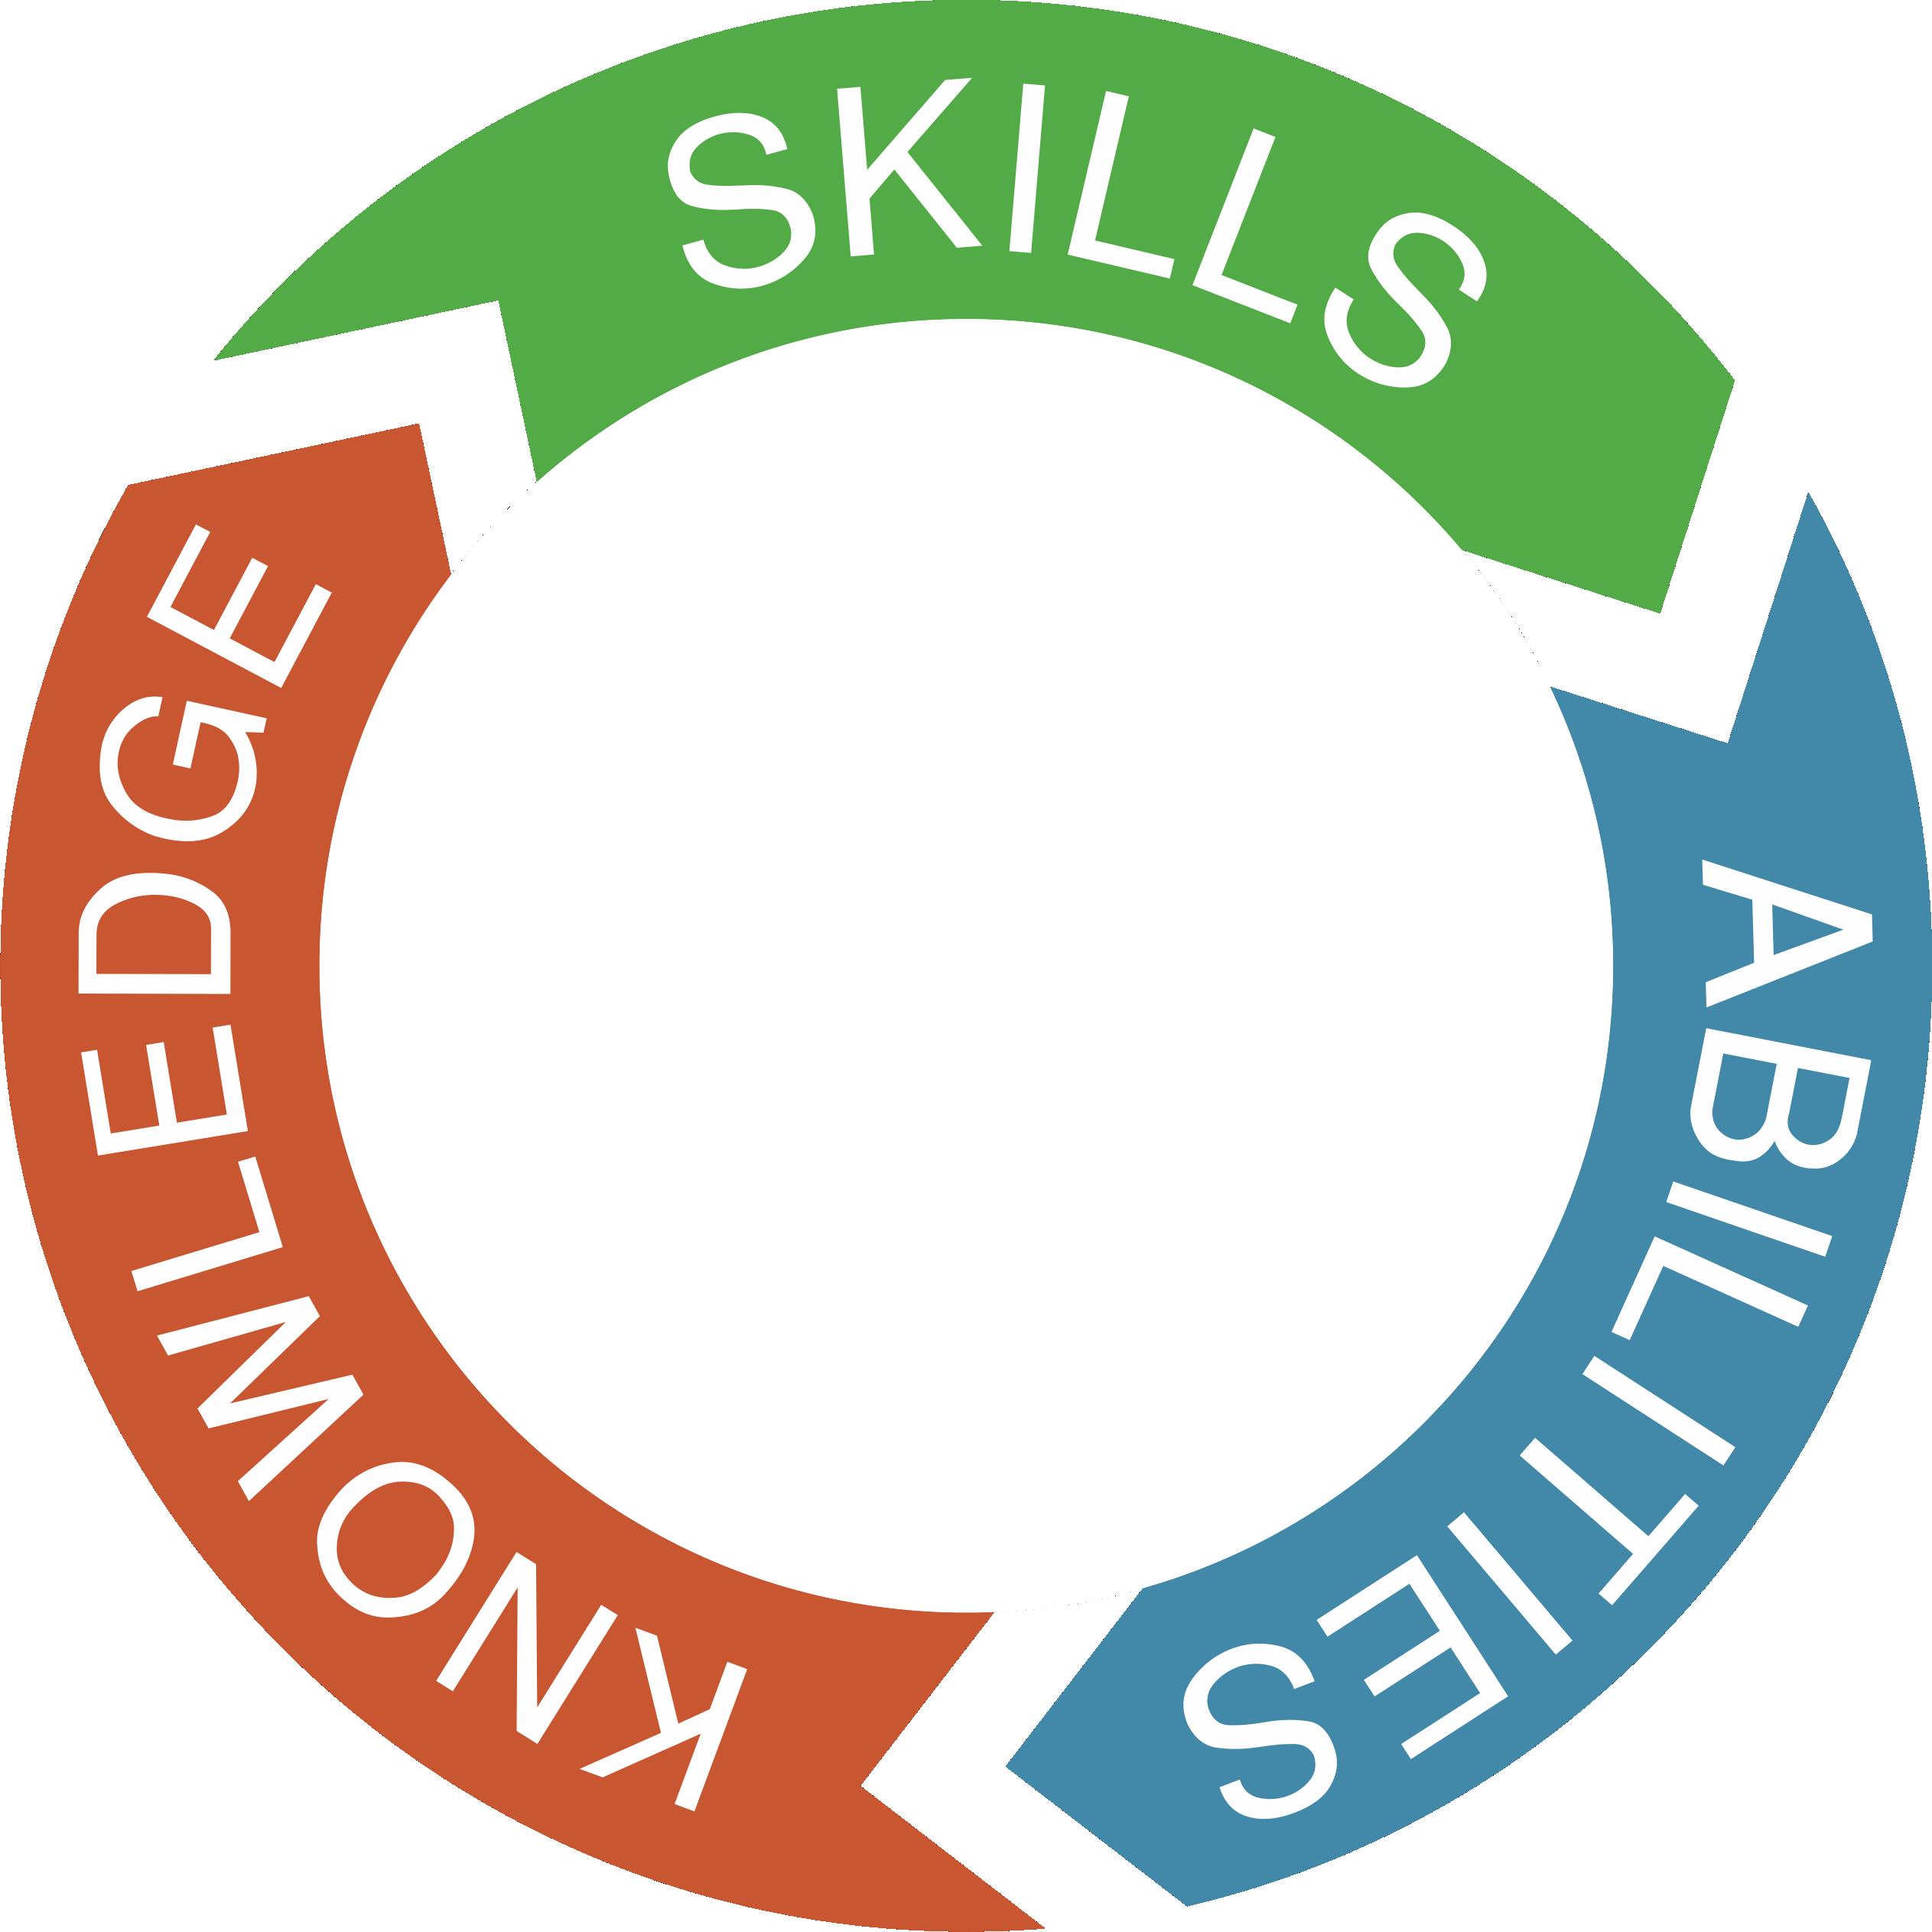 Knowledge clipart office skill. Skills abilities digital nestdigital